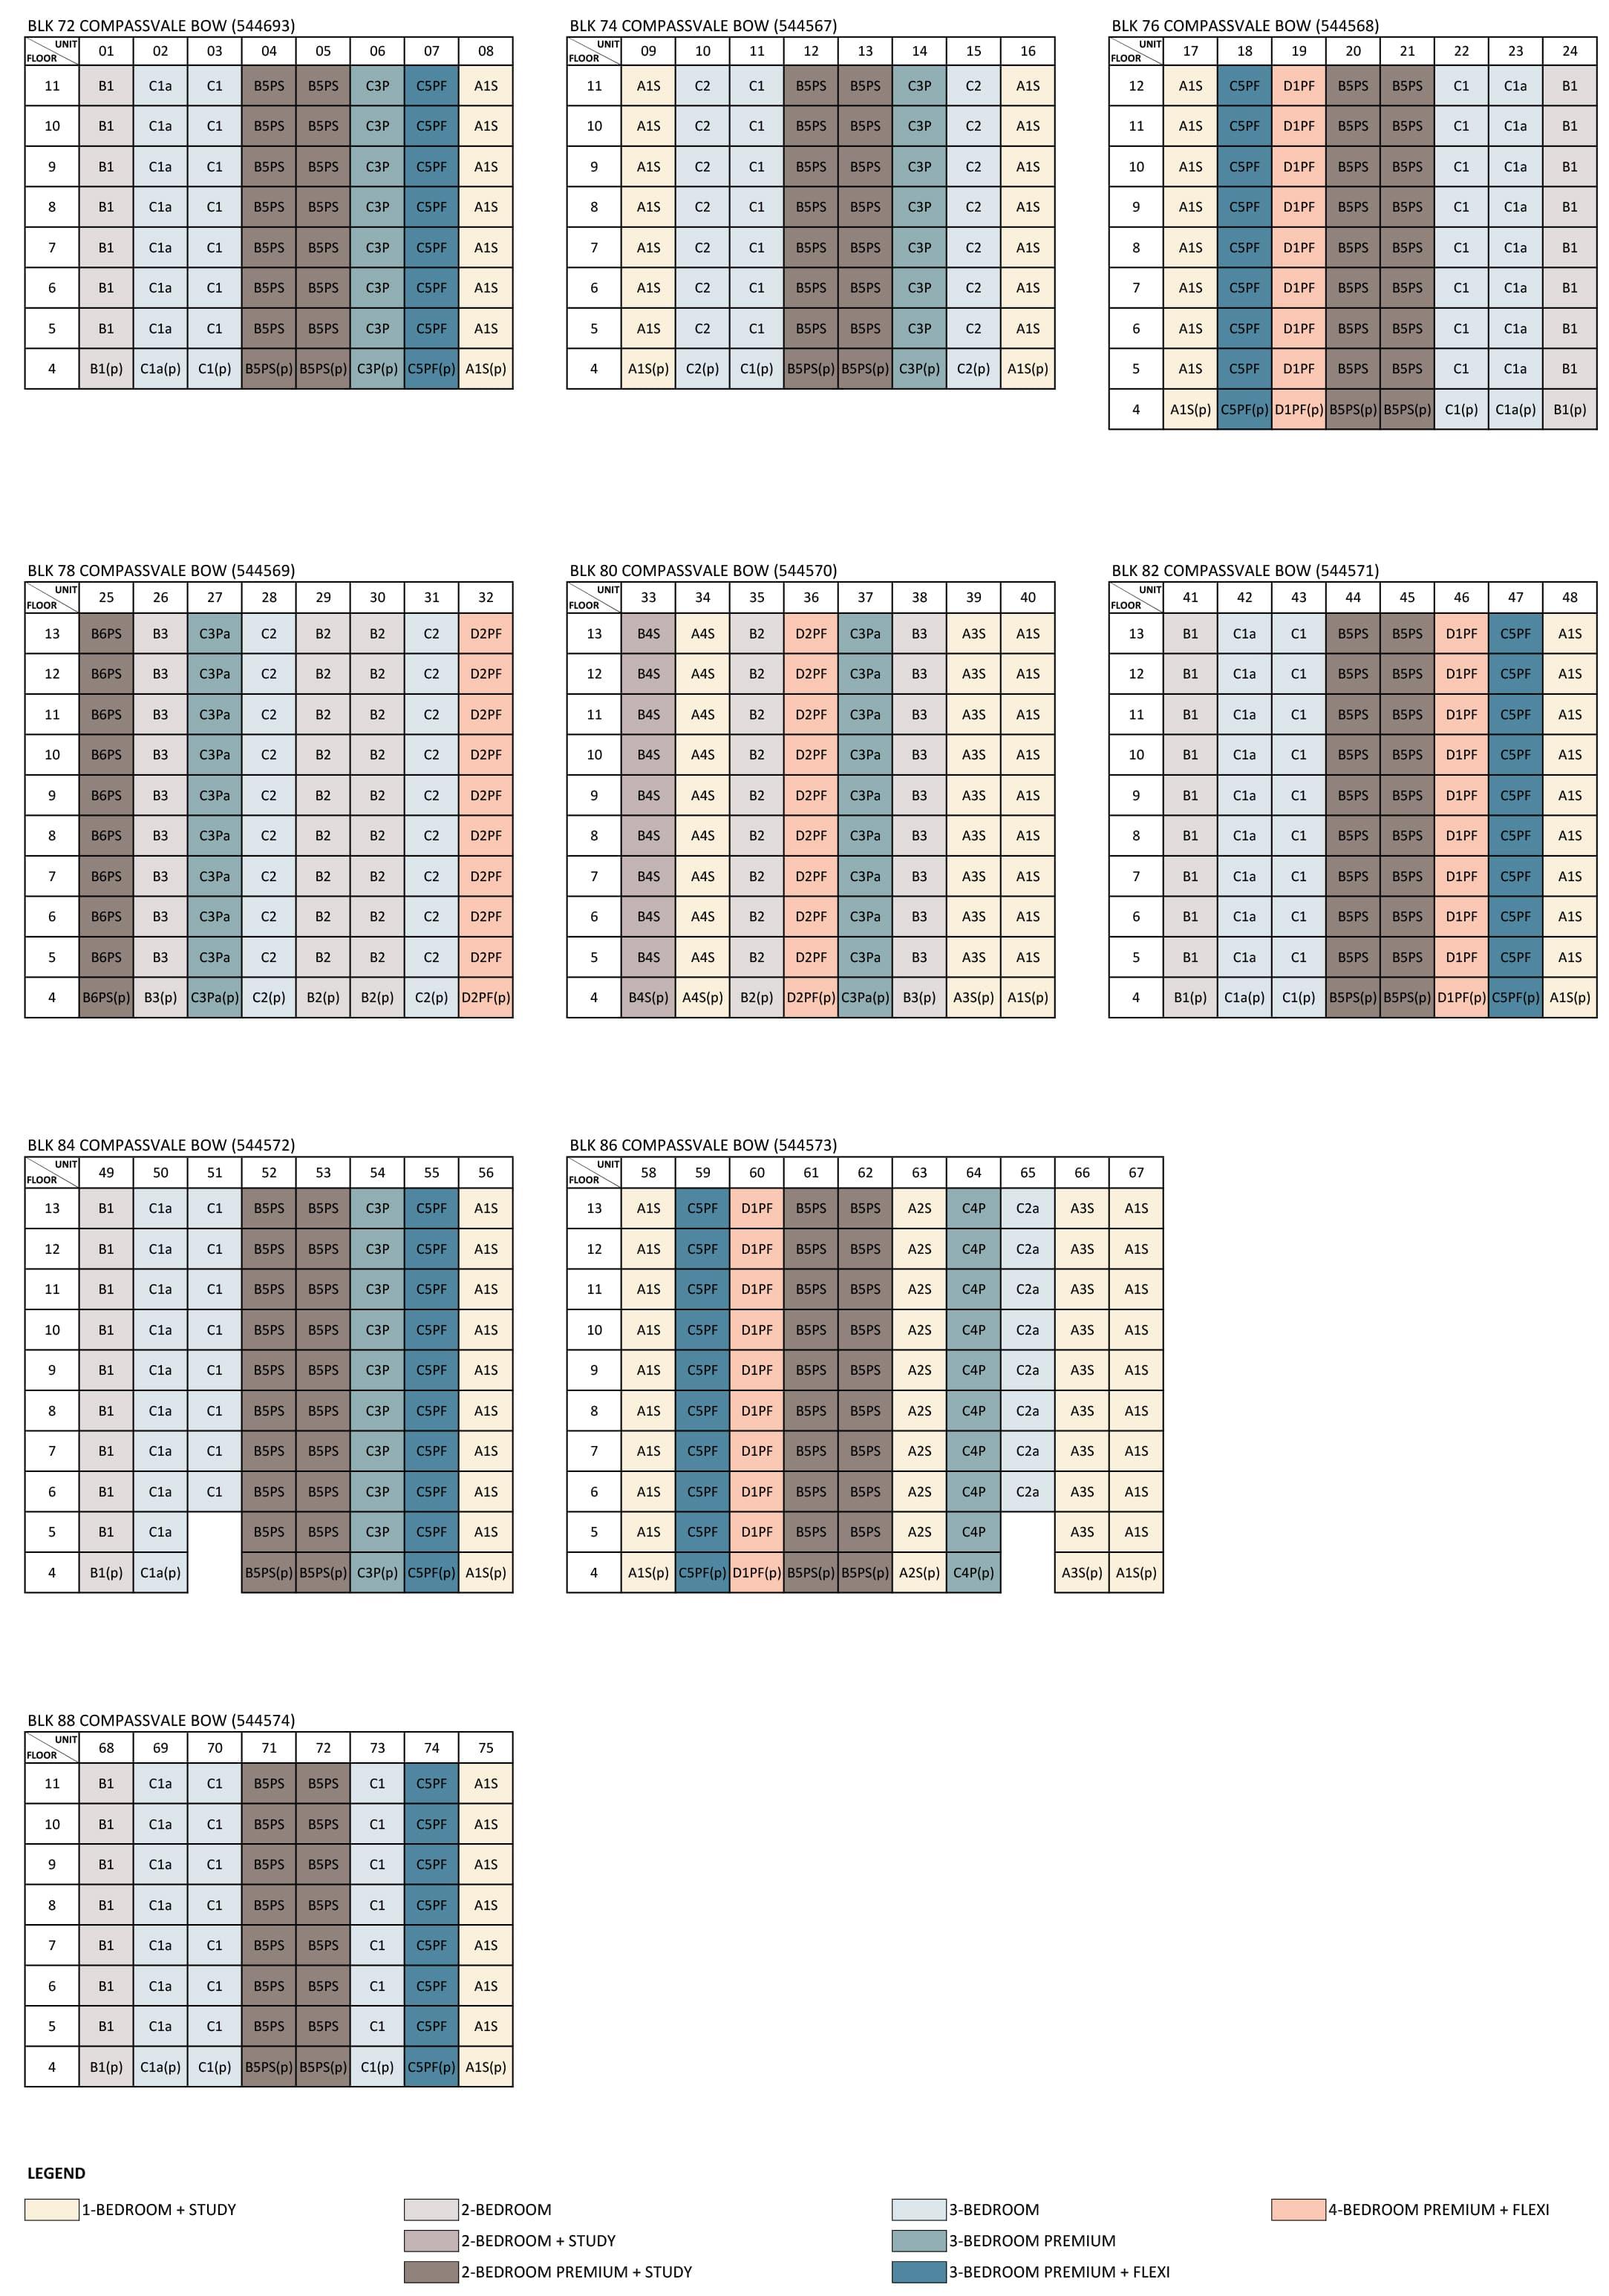 20190917_SC_Schematic Diagram_Final Draft.xlsx